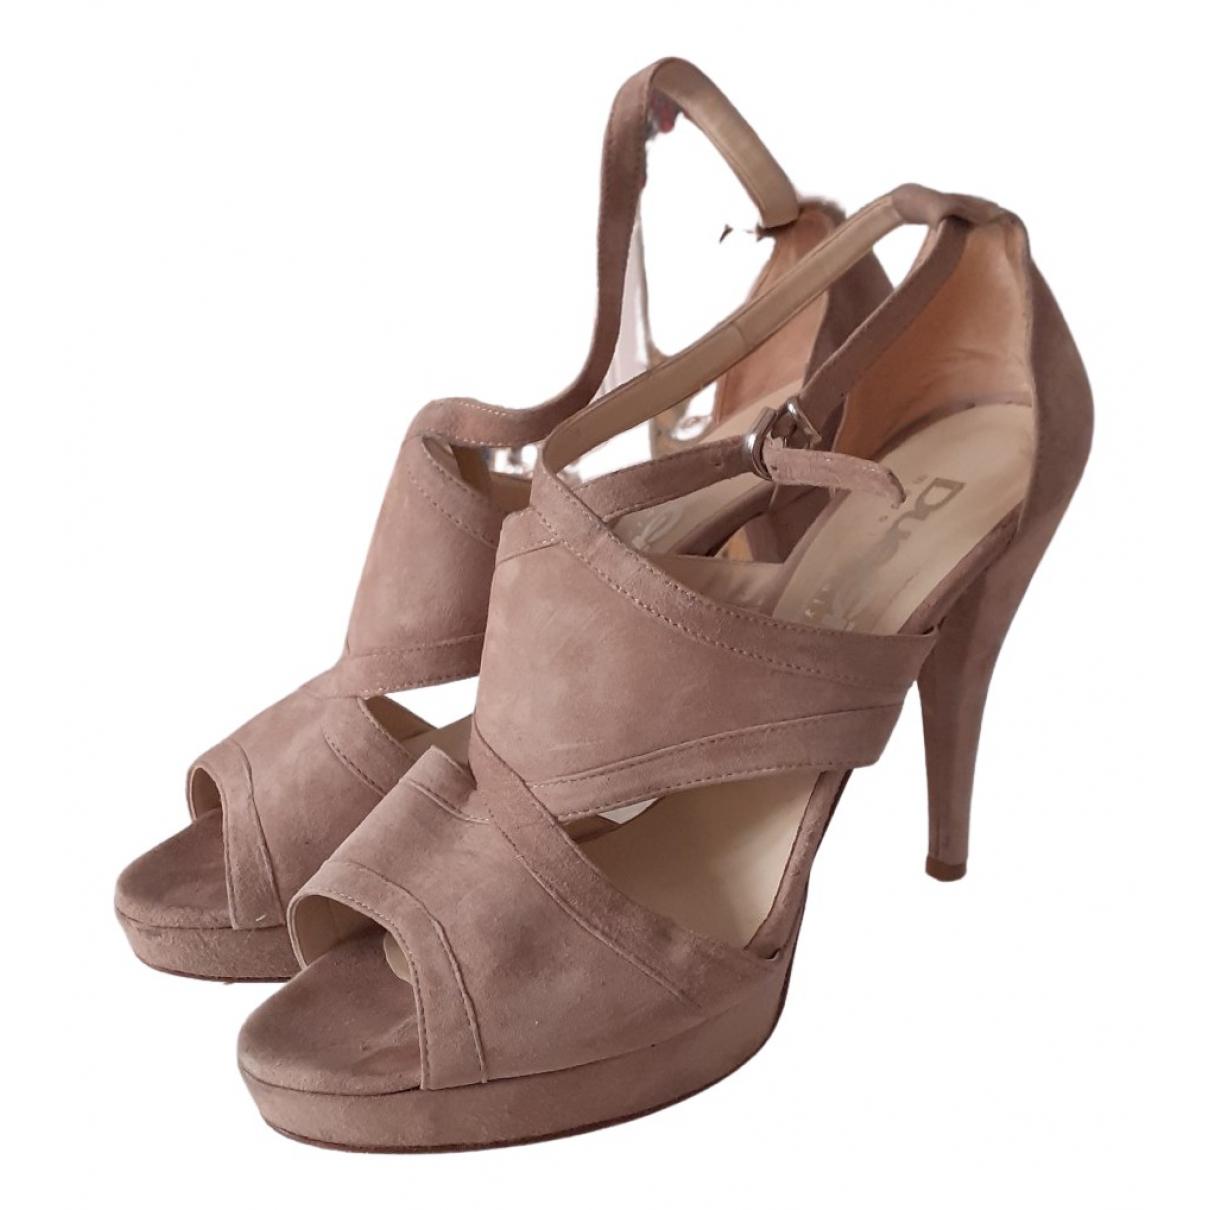 Non Signé / Unsigned N Beige Suede Sandals for Women 40 EU